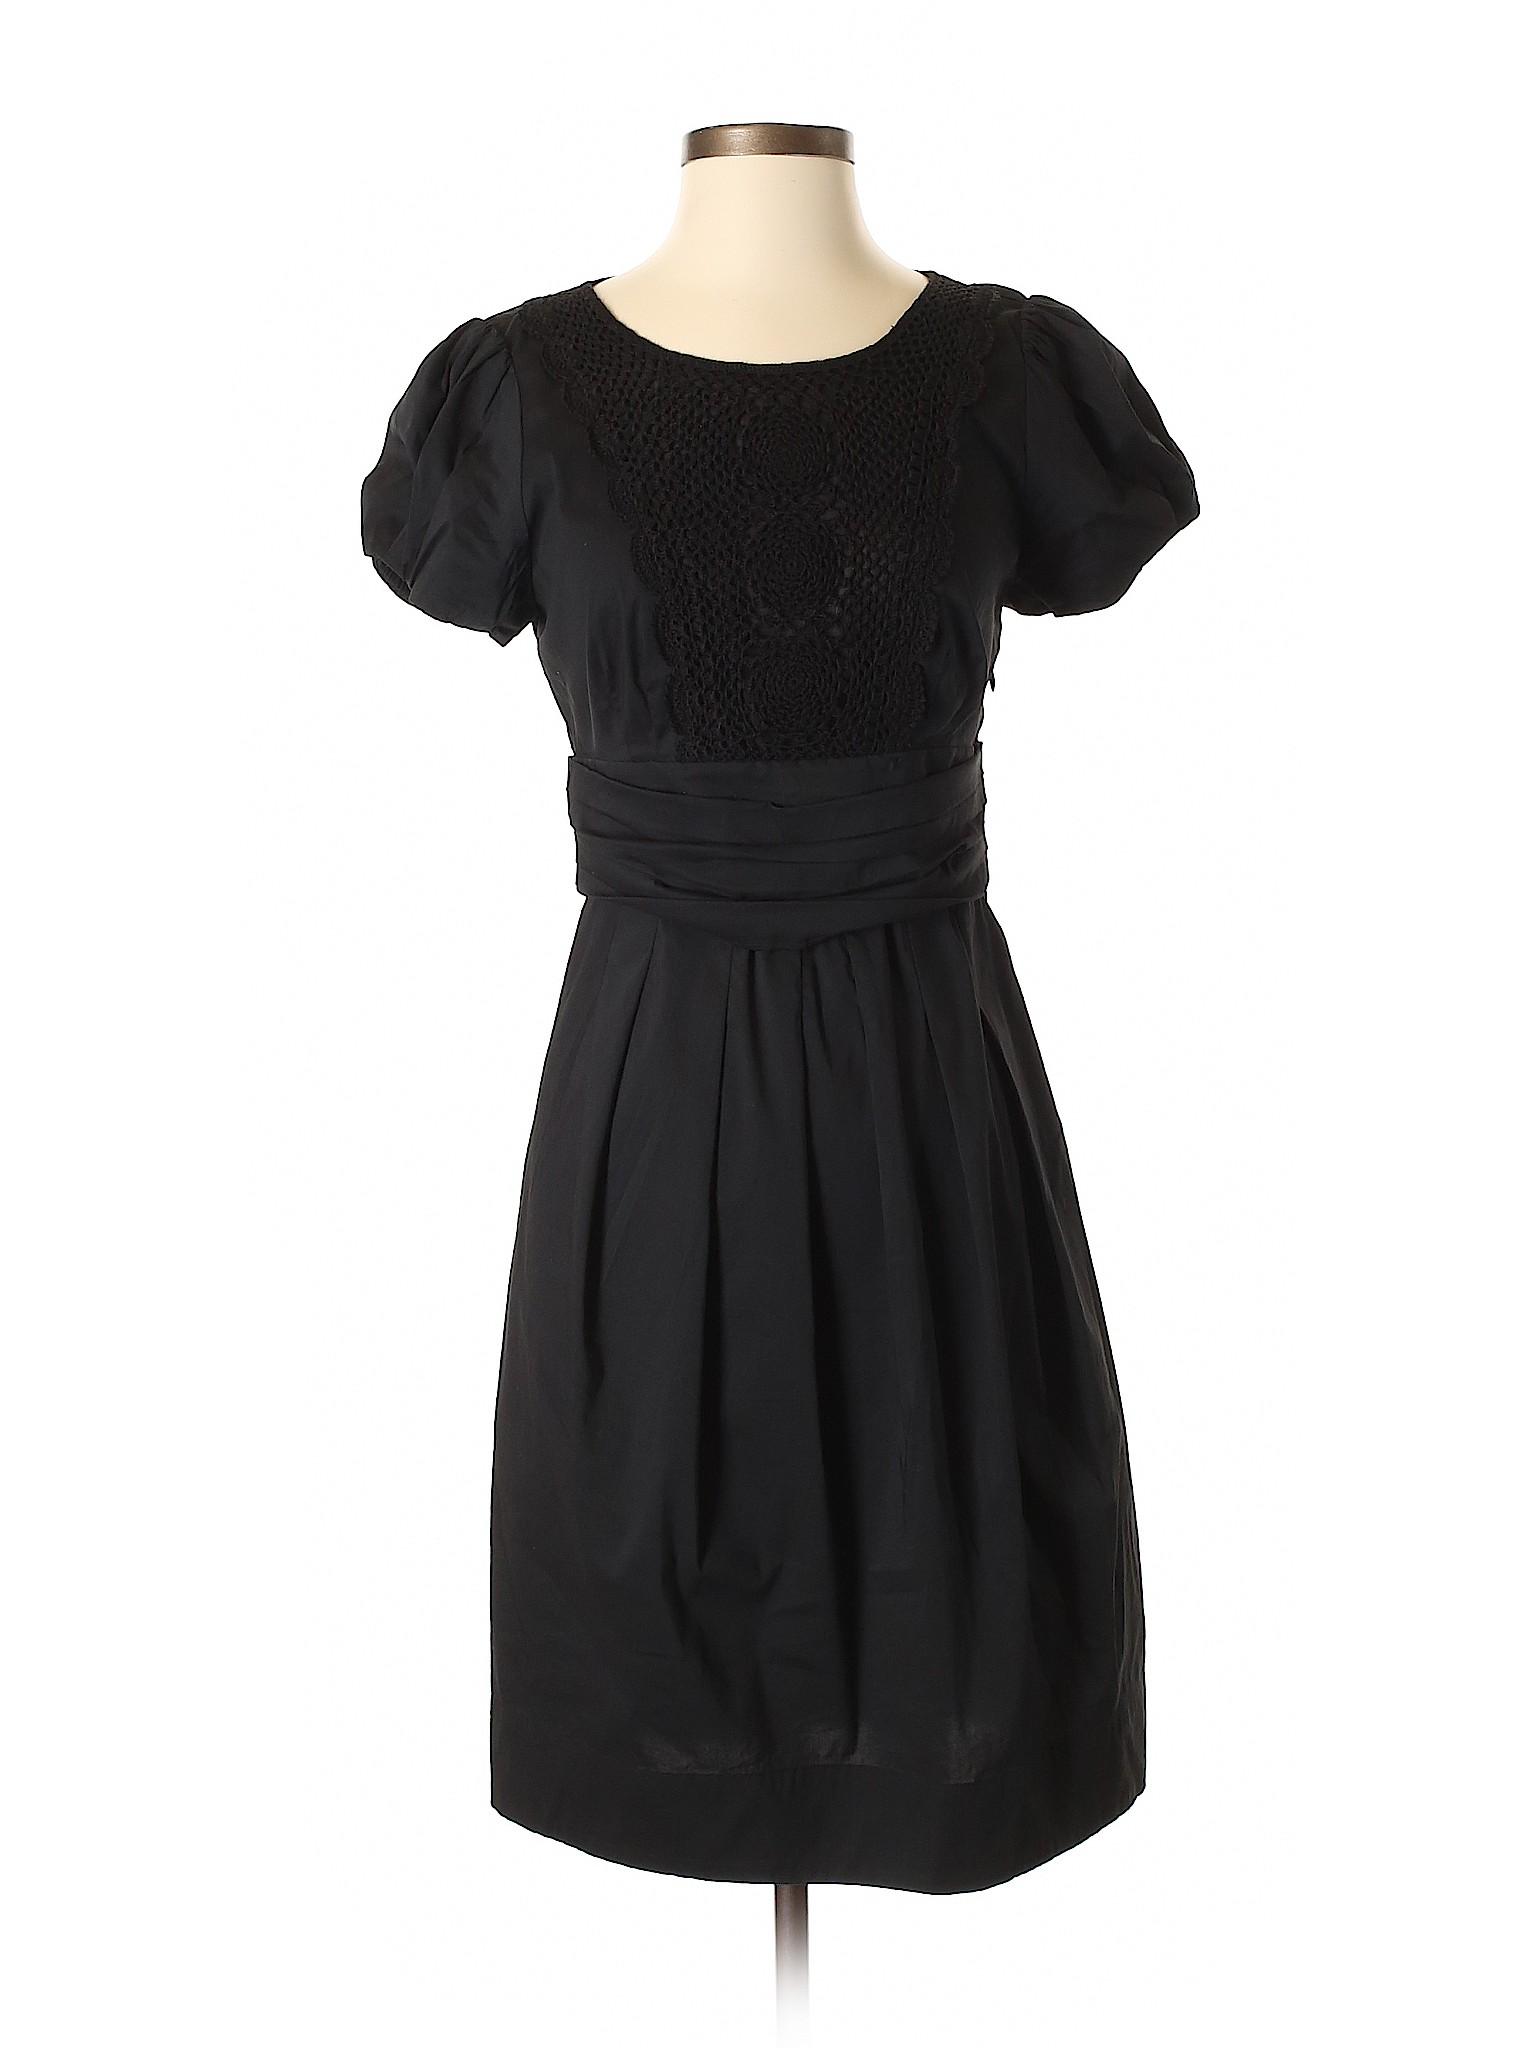 Selling BCBGMAXAZRIA Dress BCBGMAXAZRIA Dress Casual Casual Selling xTwtffq4F